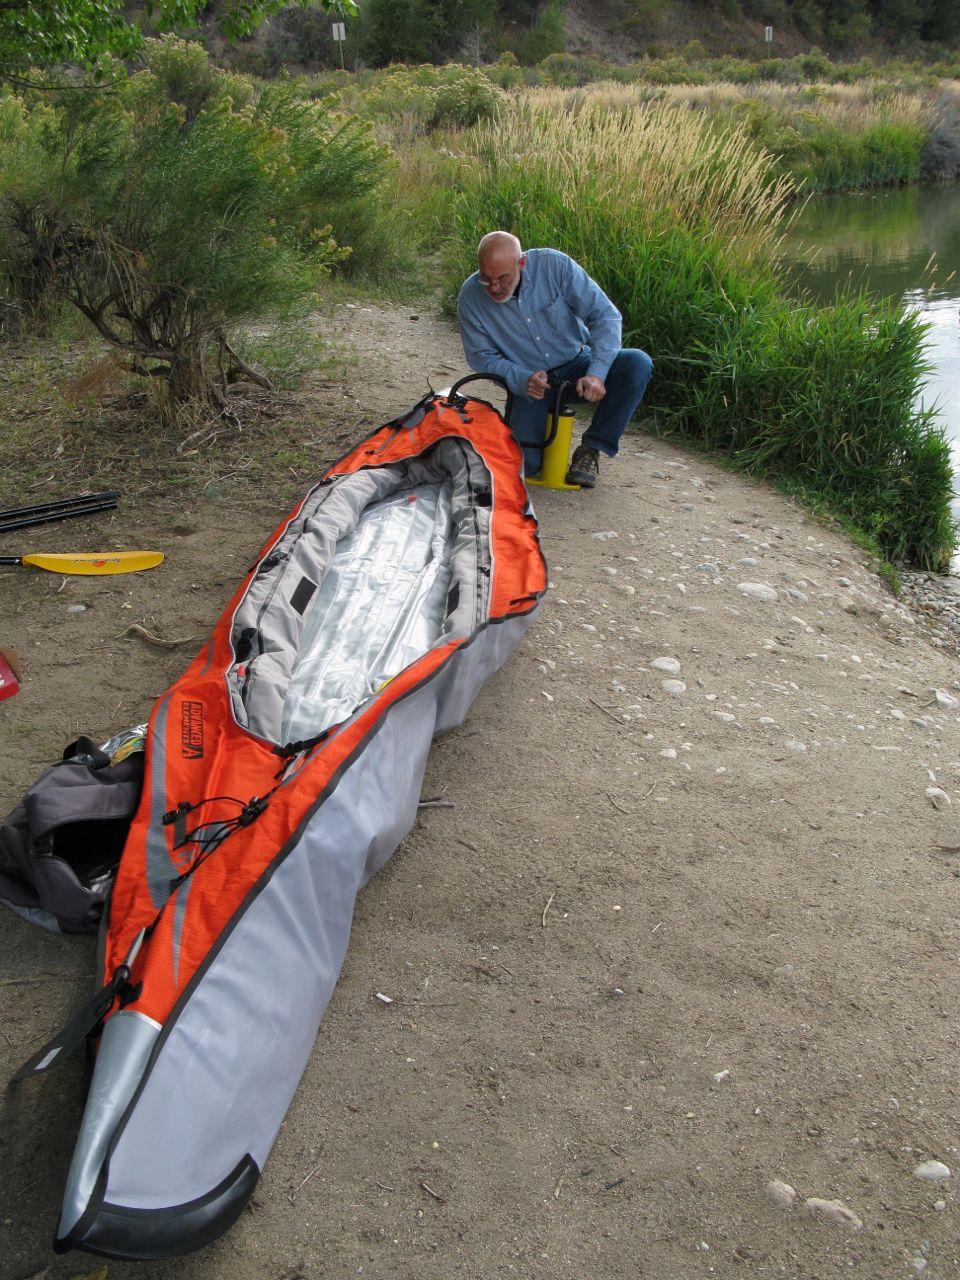 Richard Cabe inflating our brand-new kayak at Frantz Lake, September 2009.